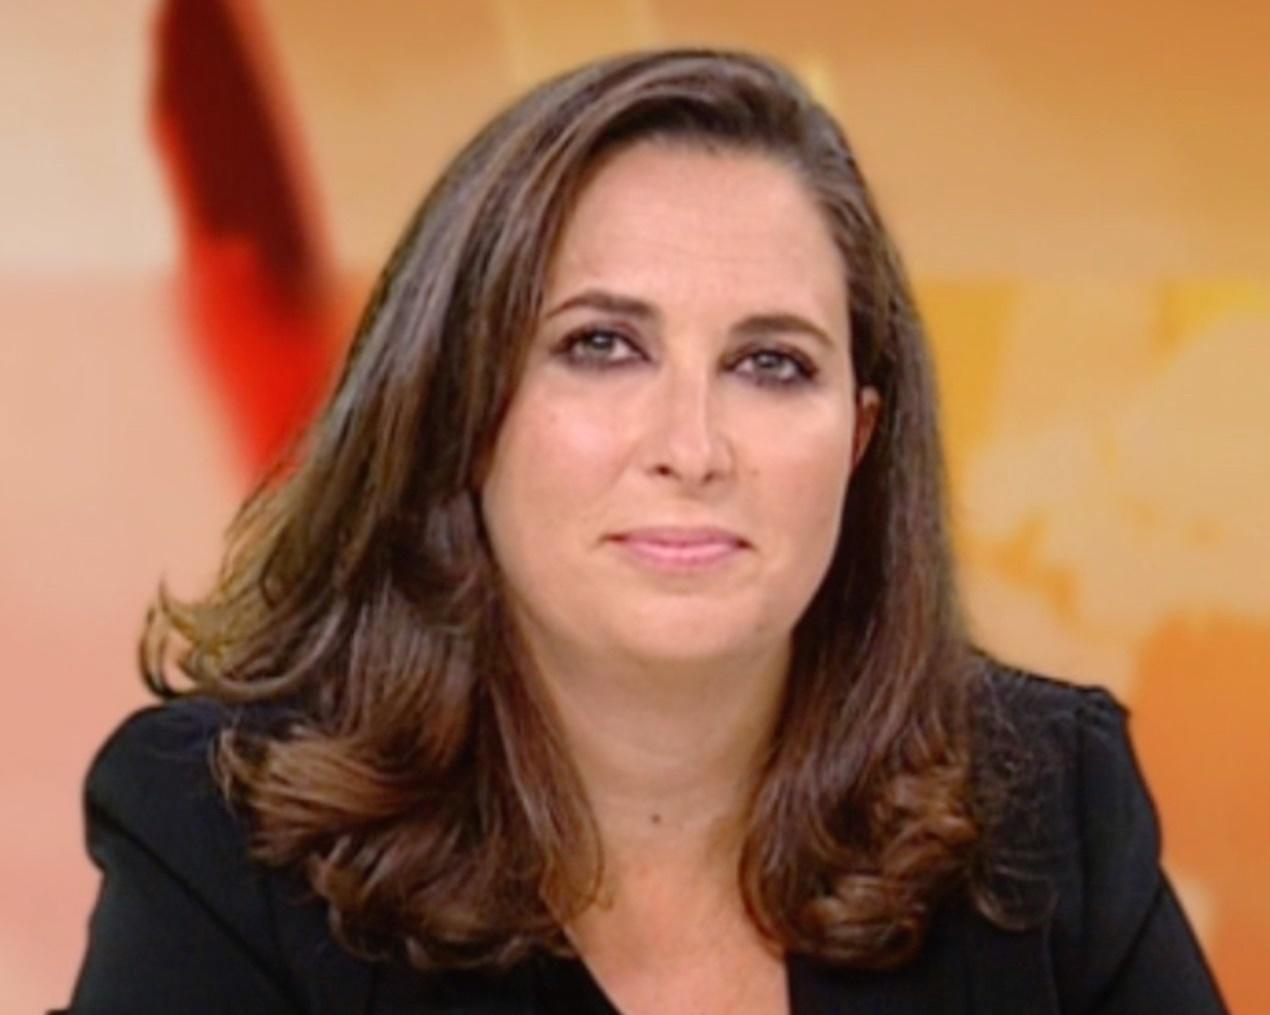 Filipa Duarte-Ramos